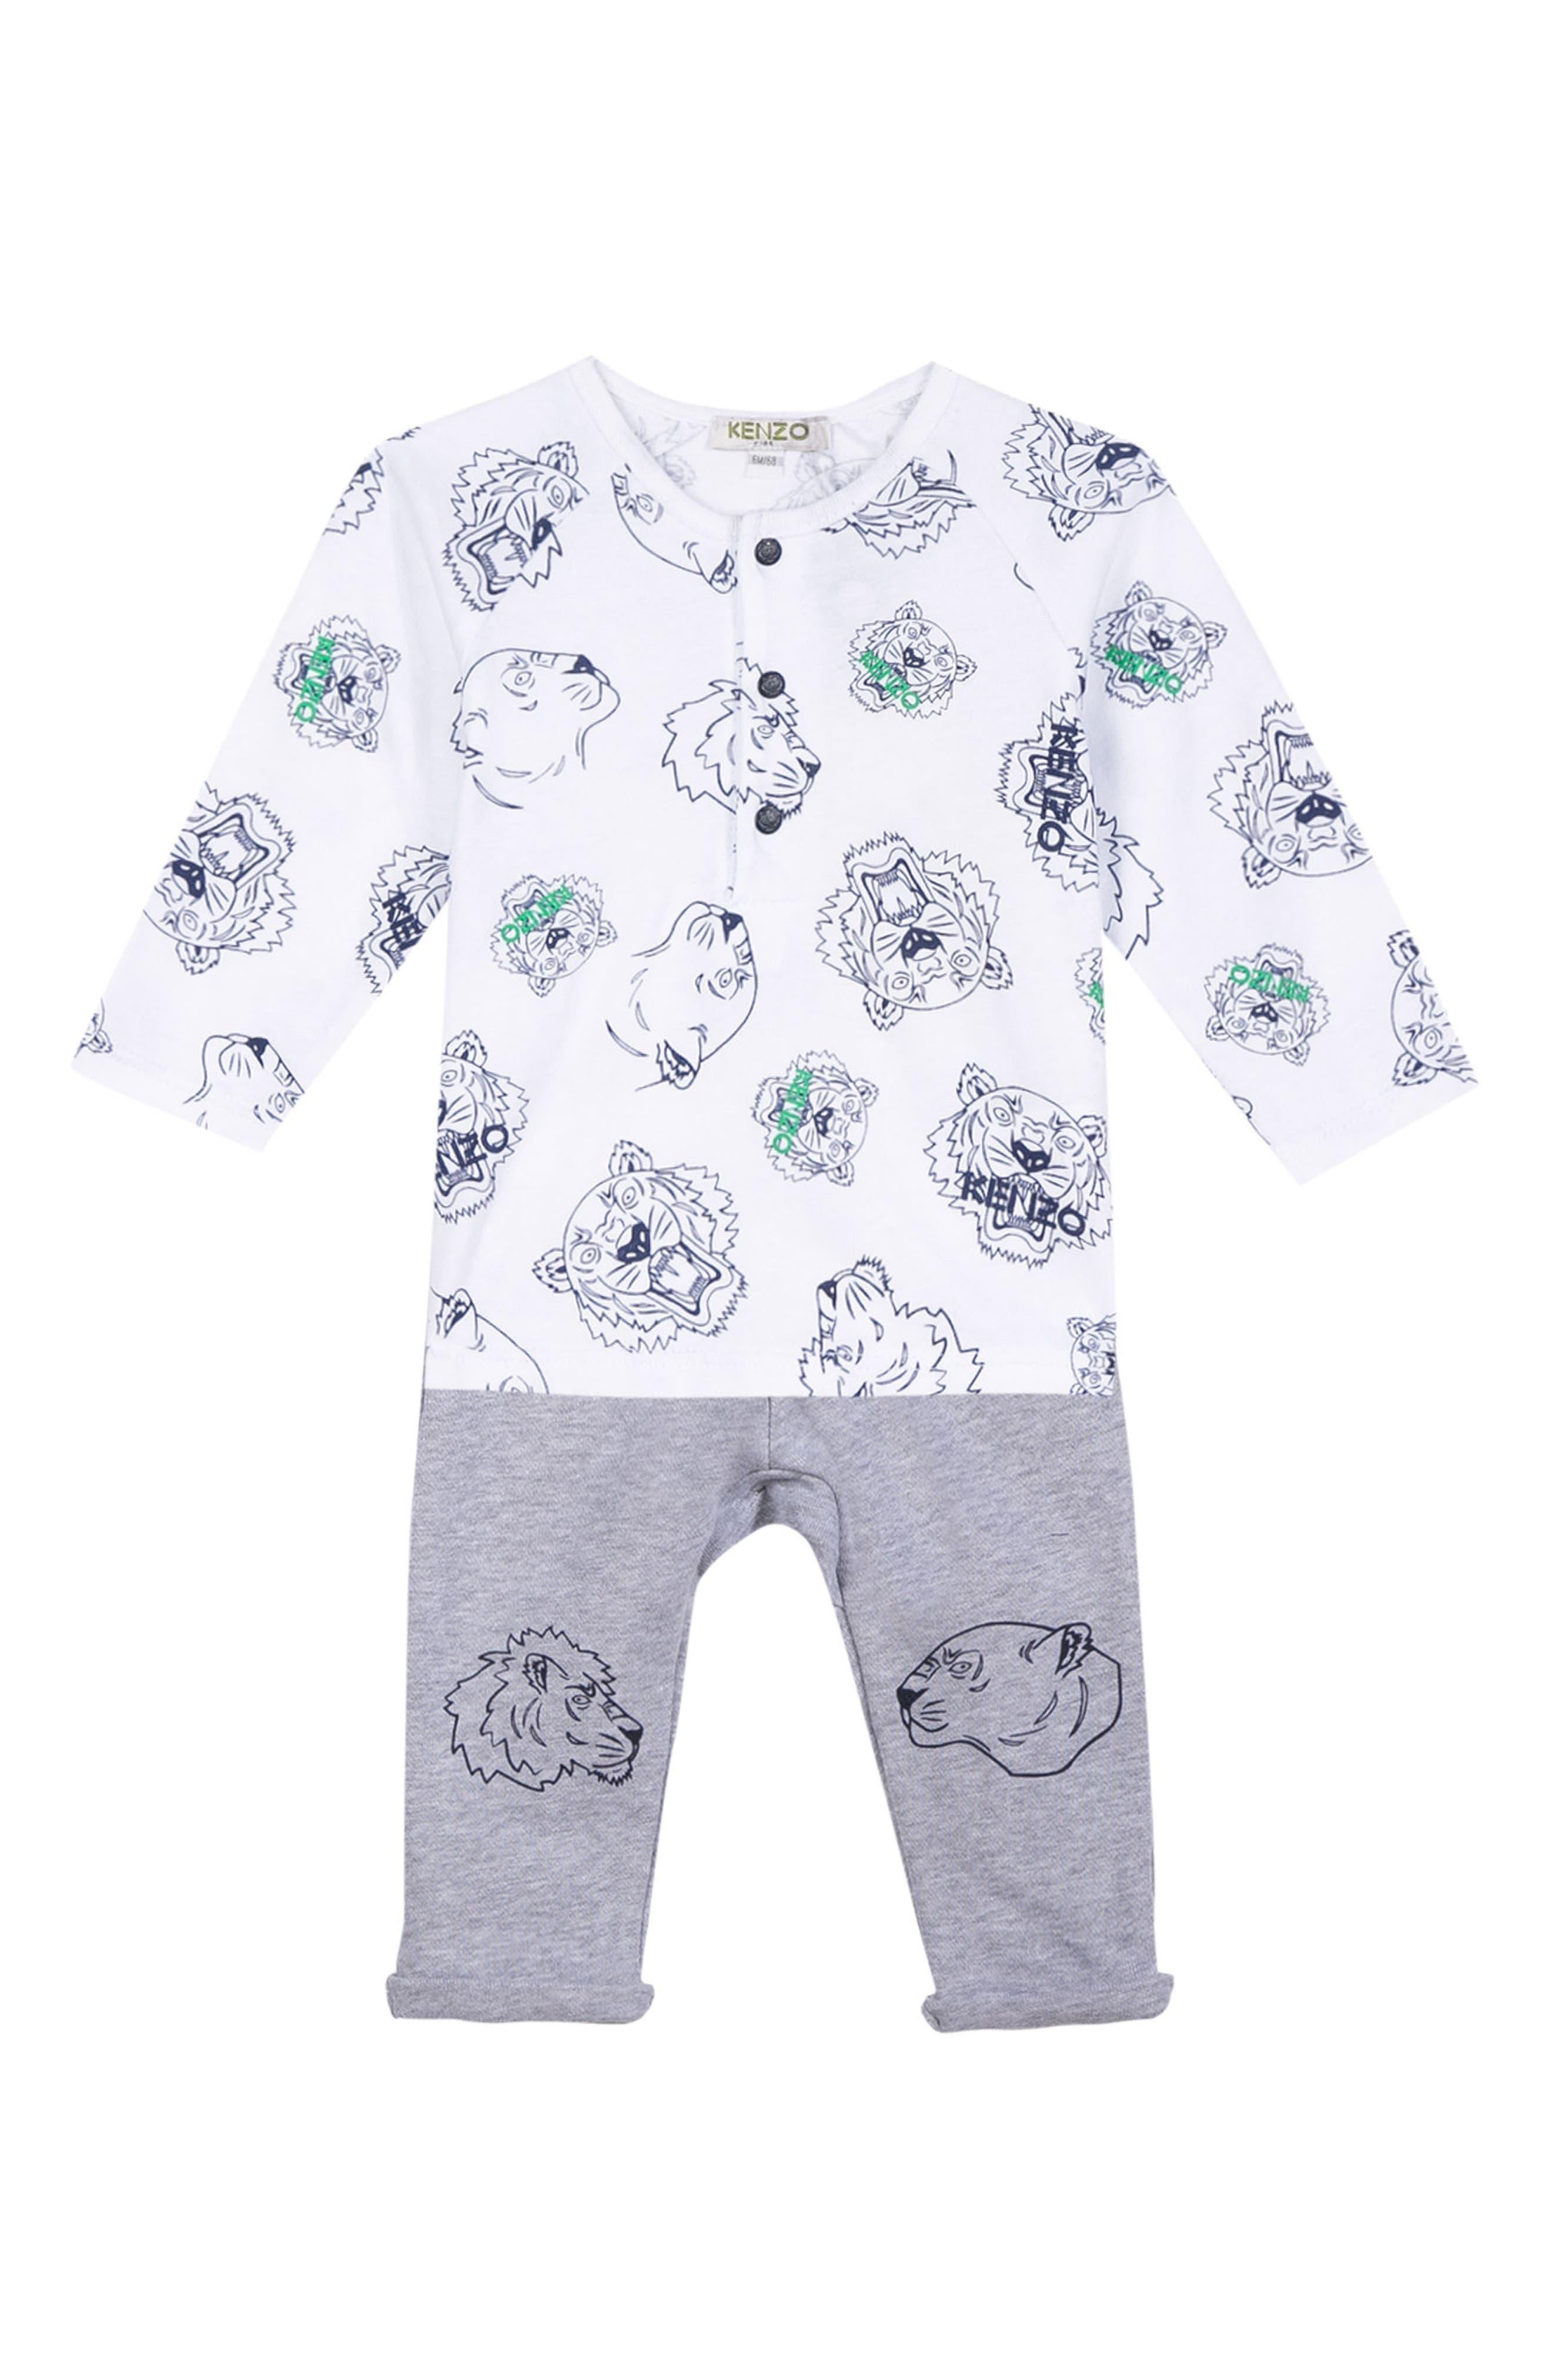 9d0bf7e2 kenzo t shirt boys sale > OFF63% Discounts